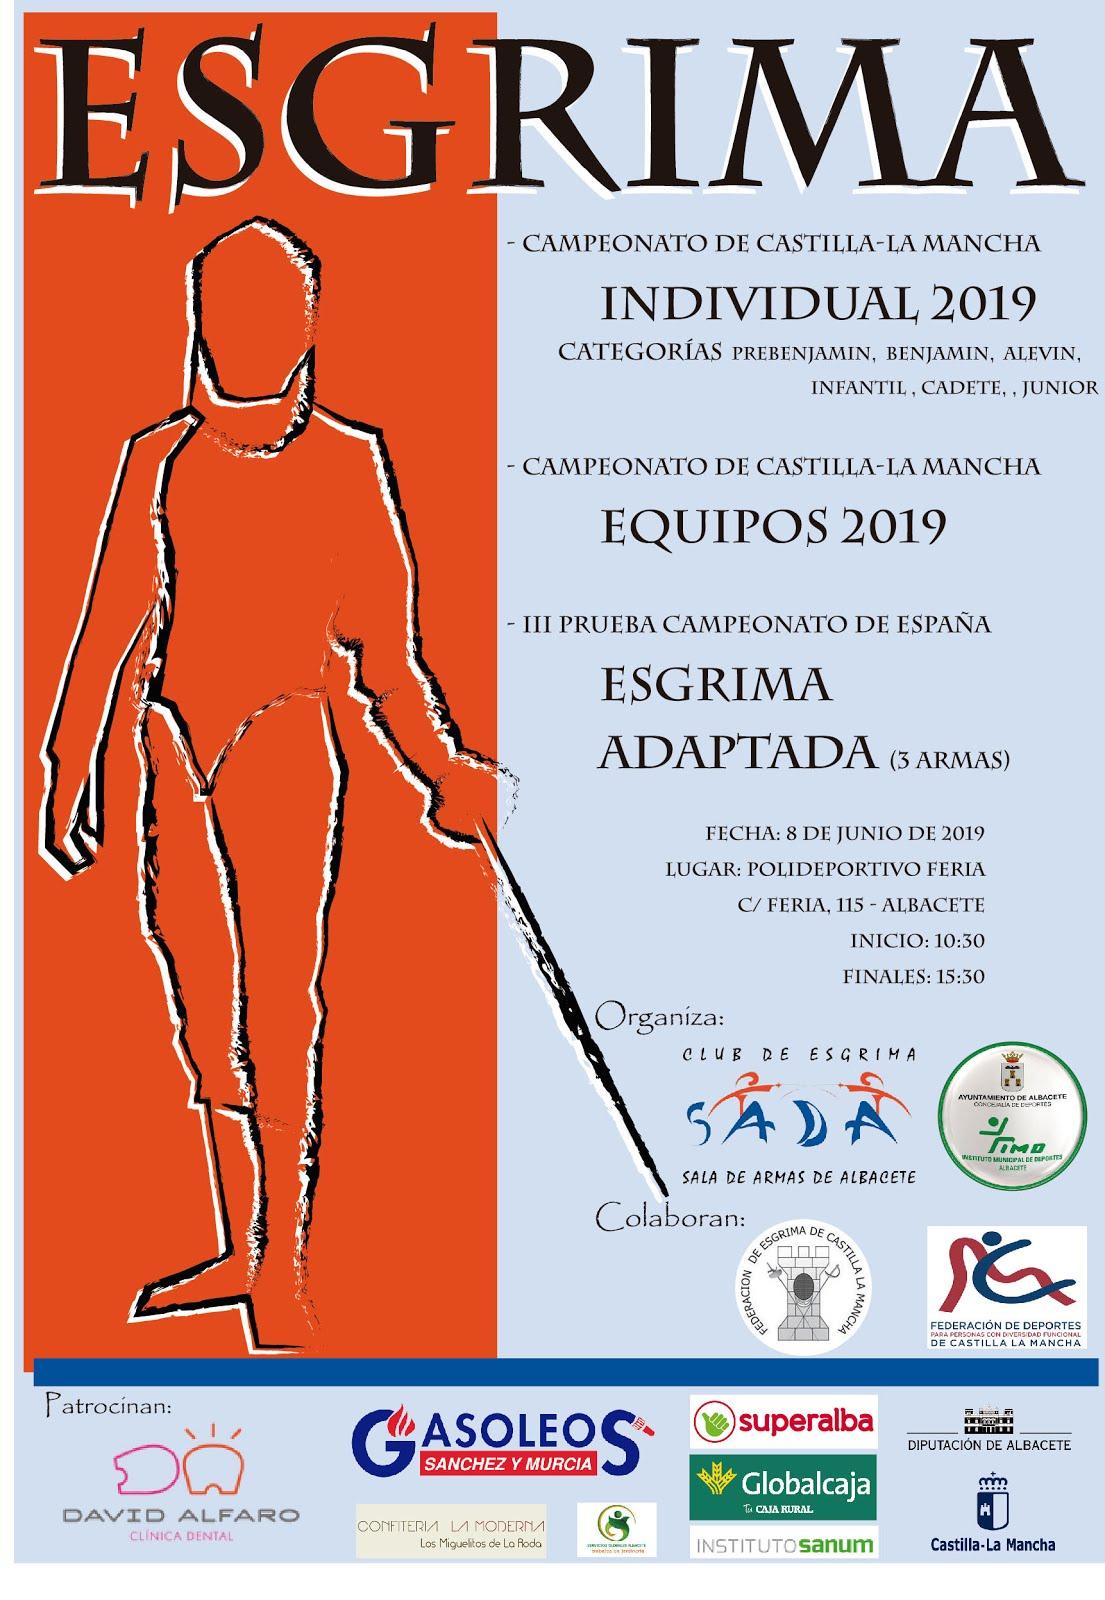 CAMPEONATO C-LM 2019